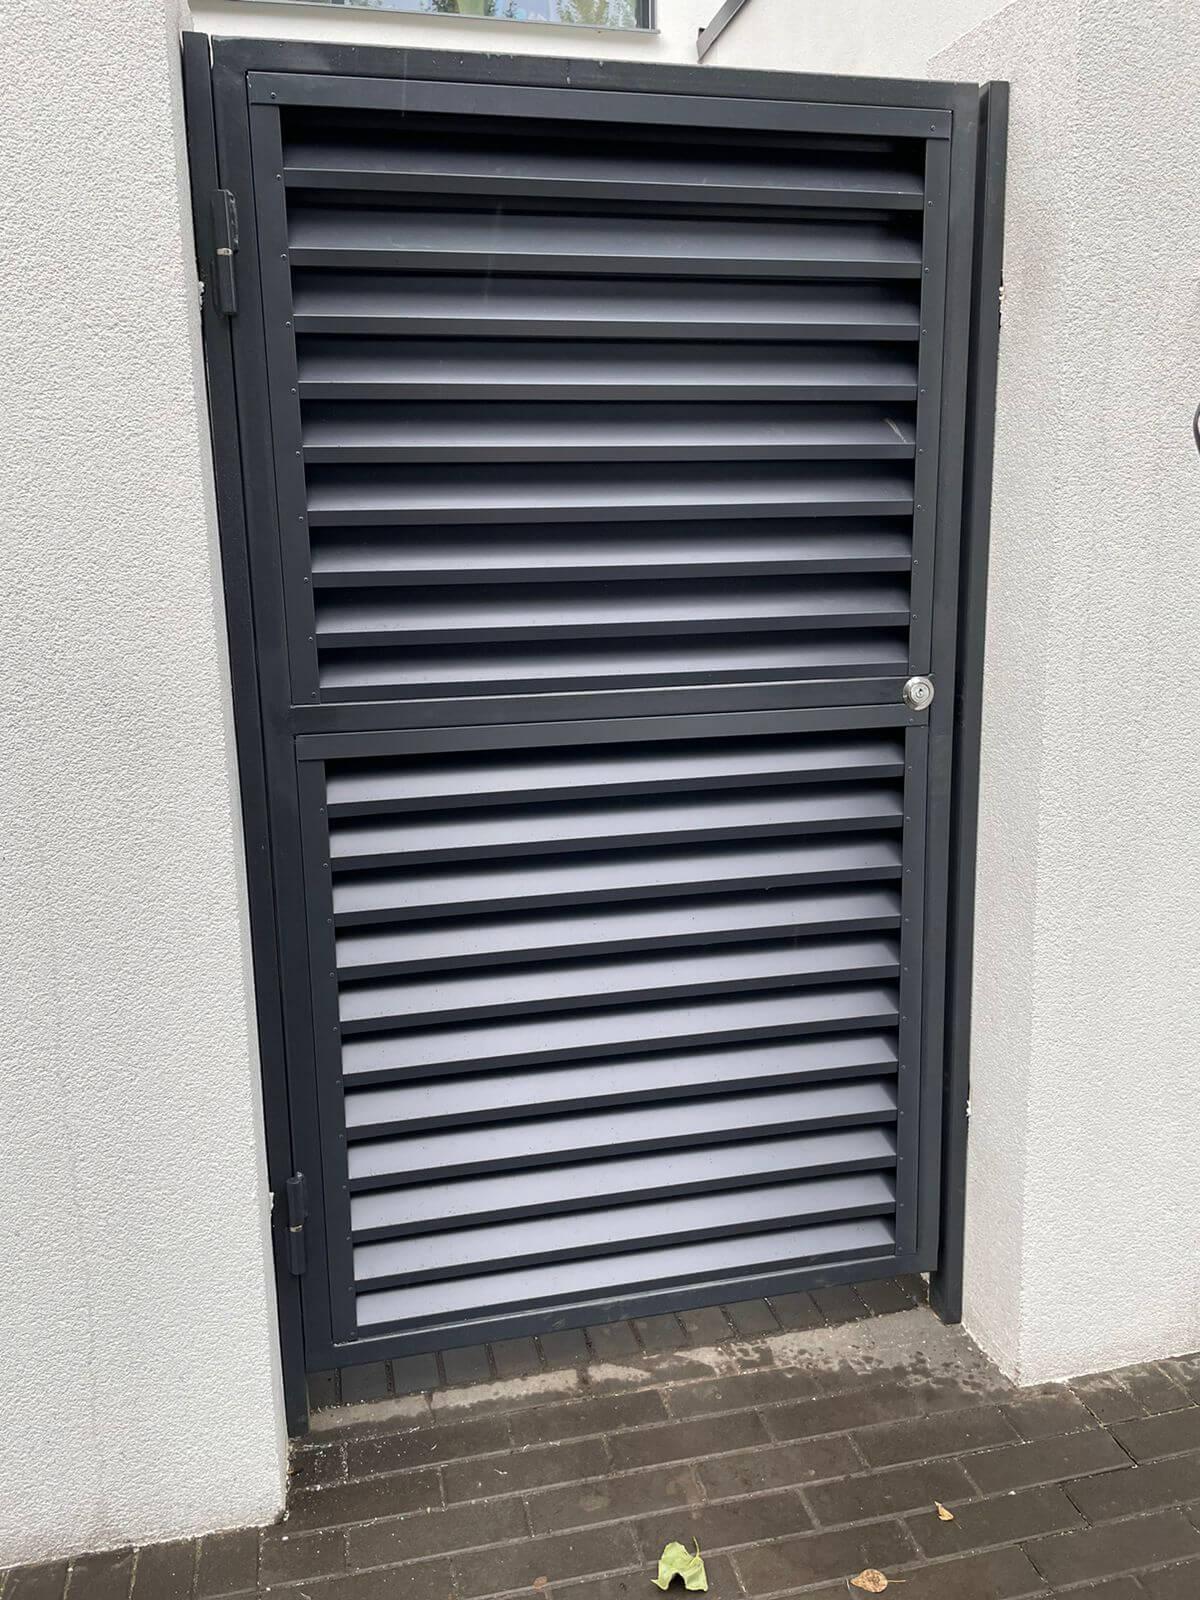 забор-жалюзи с ламелями ЭКО-Z Серый Графит двухсторонний фото6